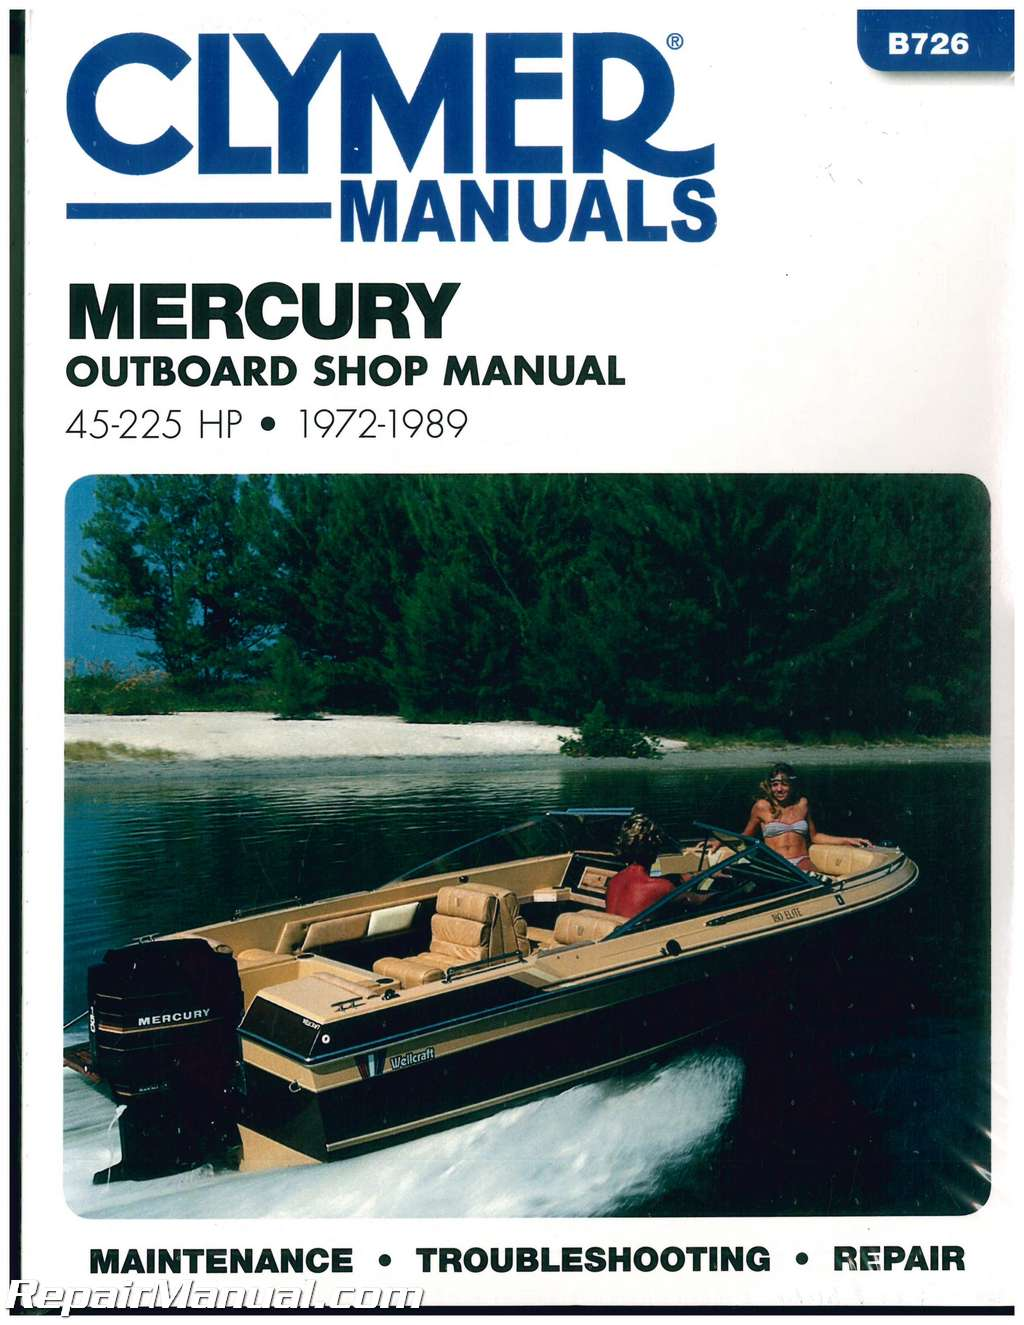 1972-1989 Mercury 45-225 hp Clymer Outboard Boat Engine Repair Manual